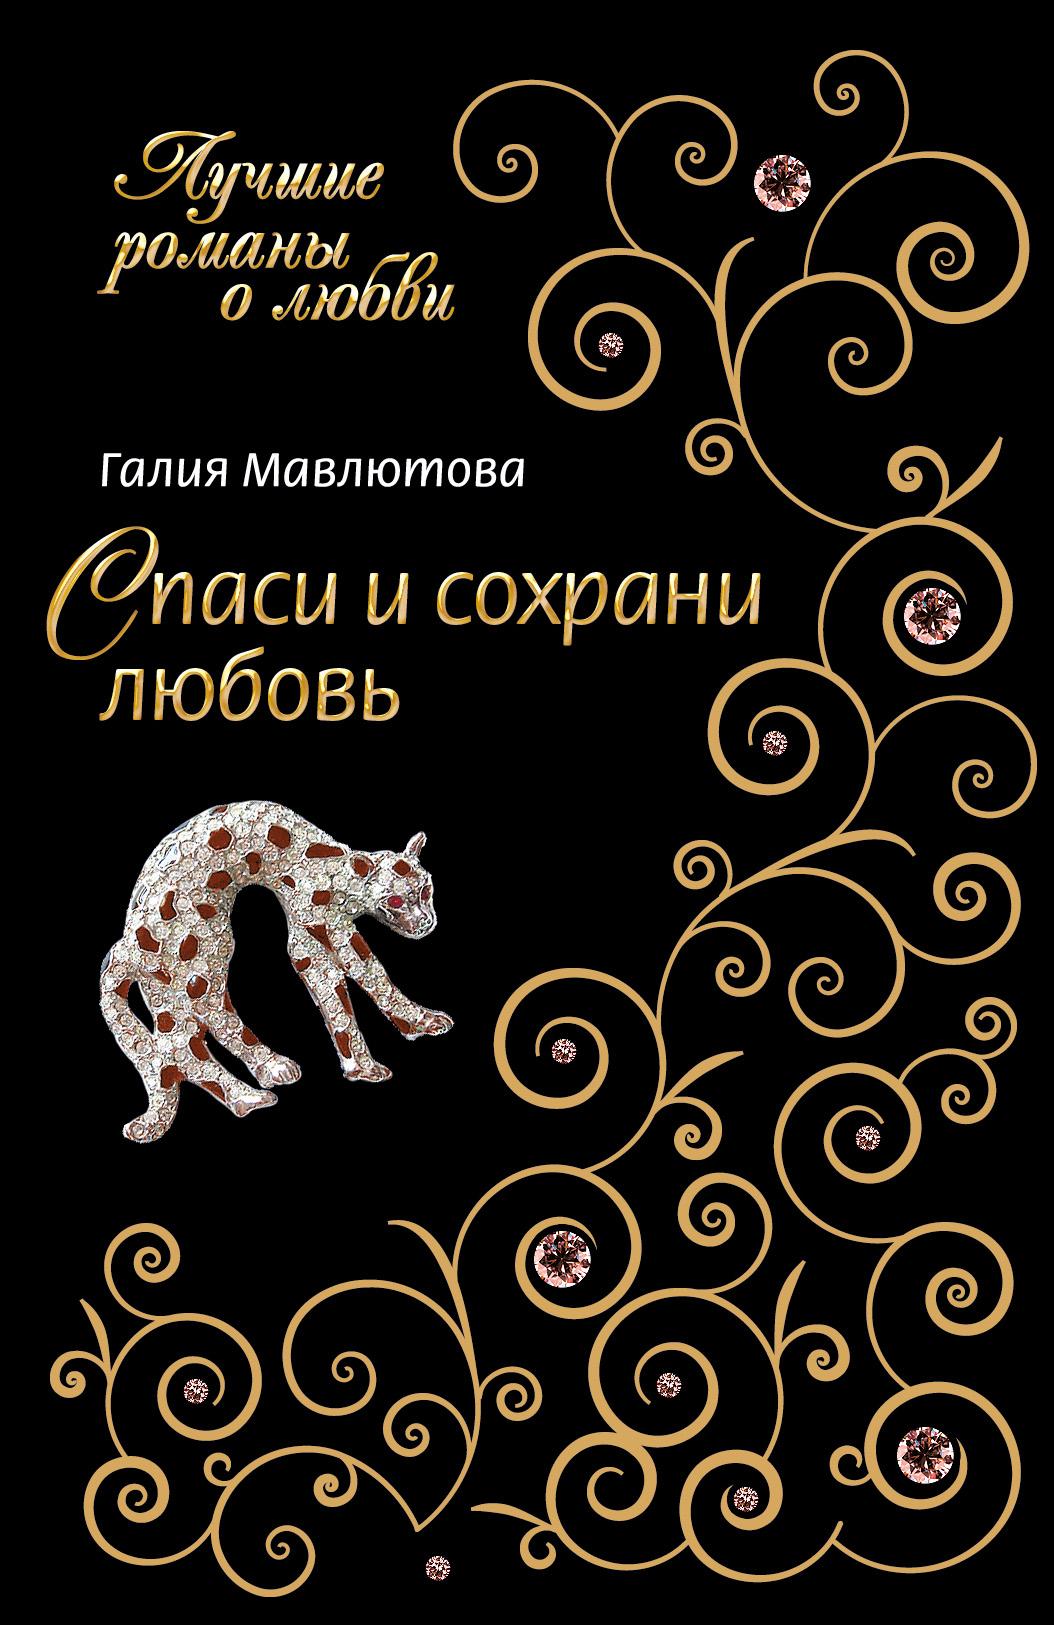 Галия Мавлютова Спаси и сохрани любовь галия мавлютова рефуа шлема